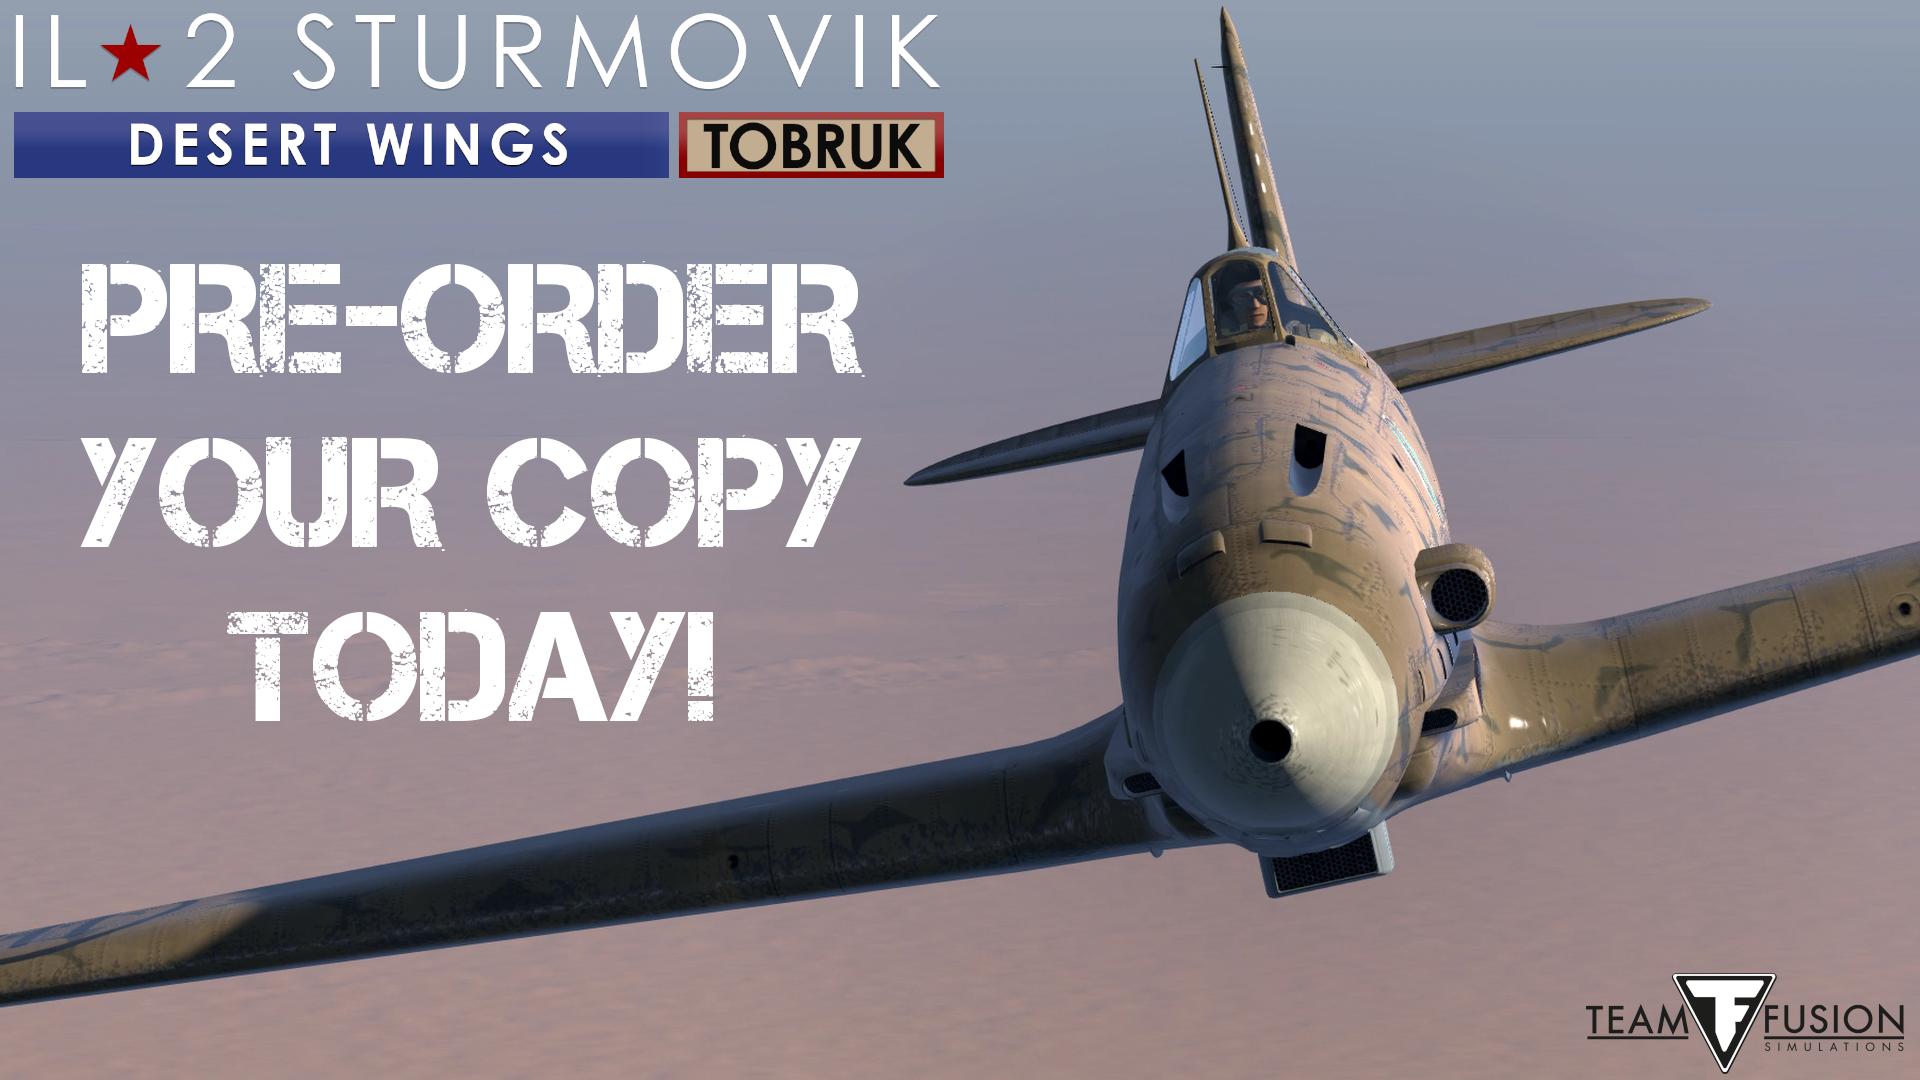 Pré-commandes d'IL2 Desert Wing Tobruk lancées EeKVRPVU0AEThvI?format=png&name=large